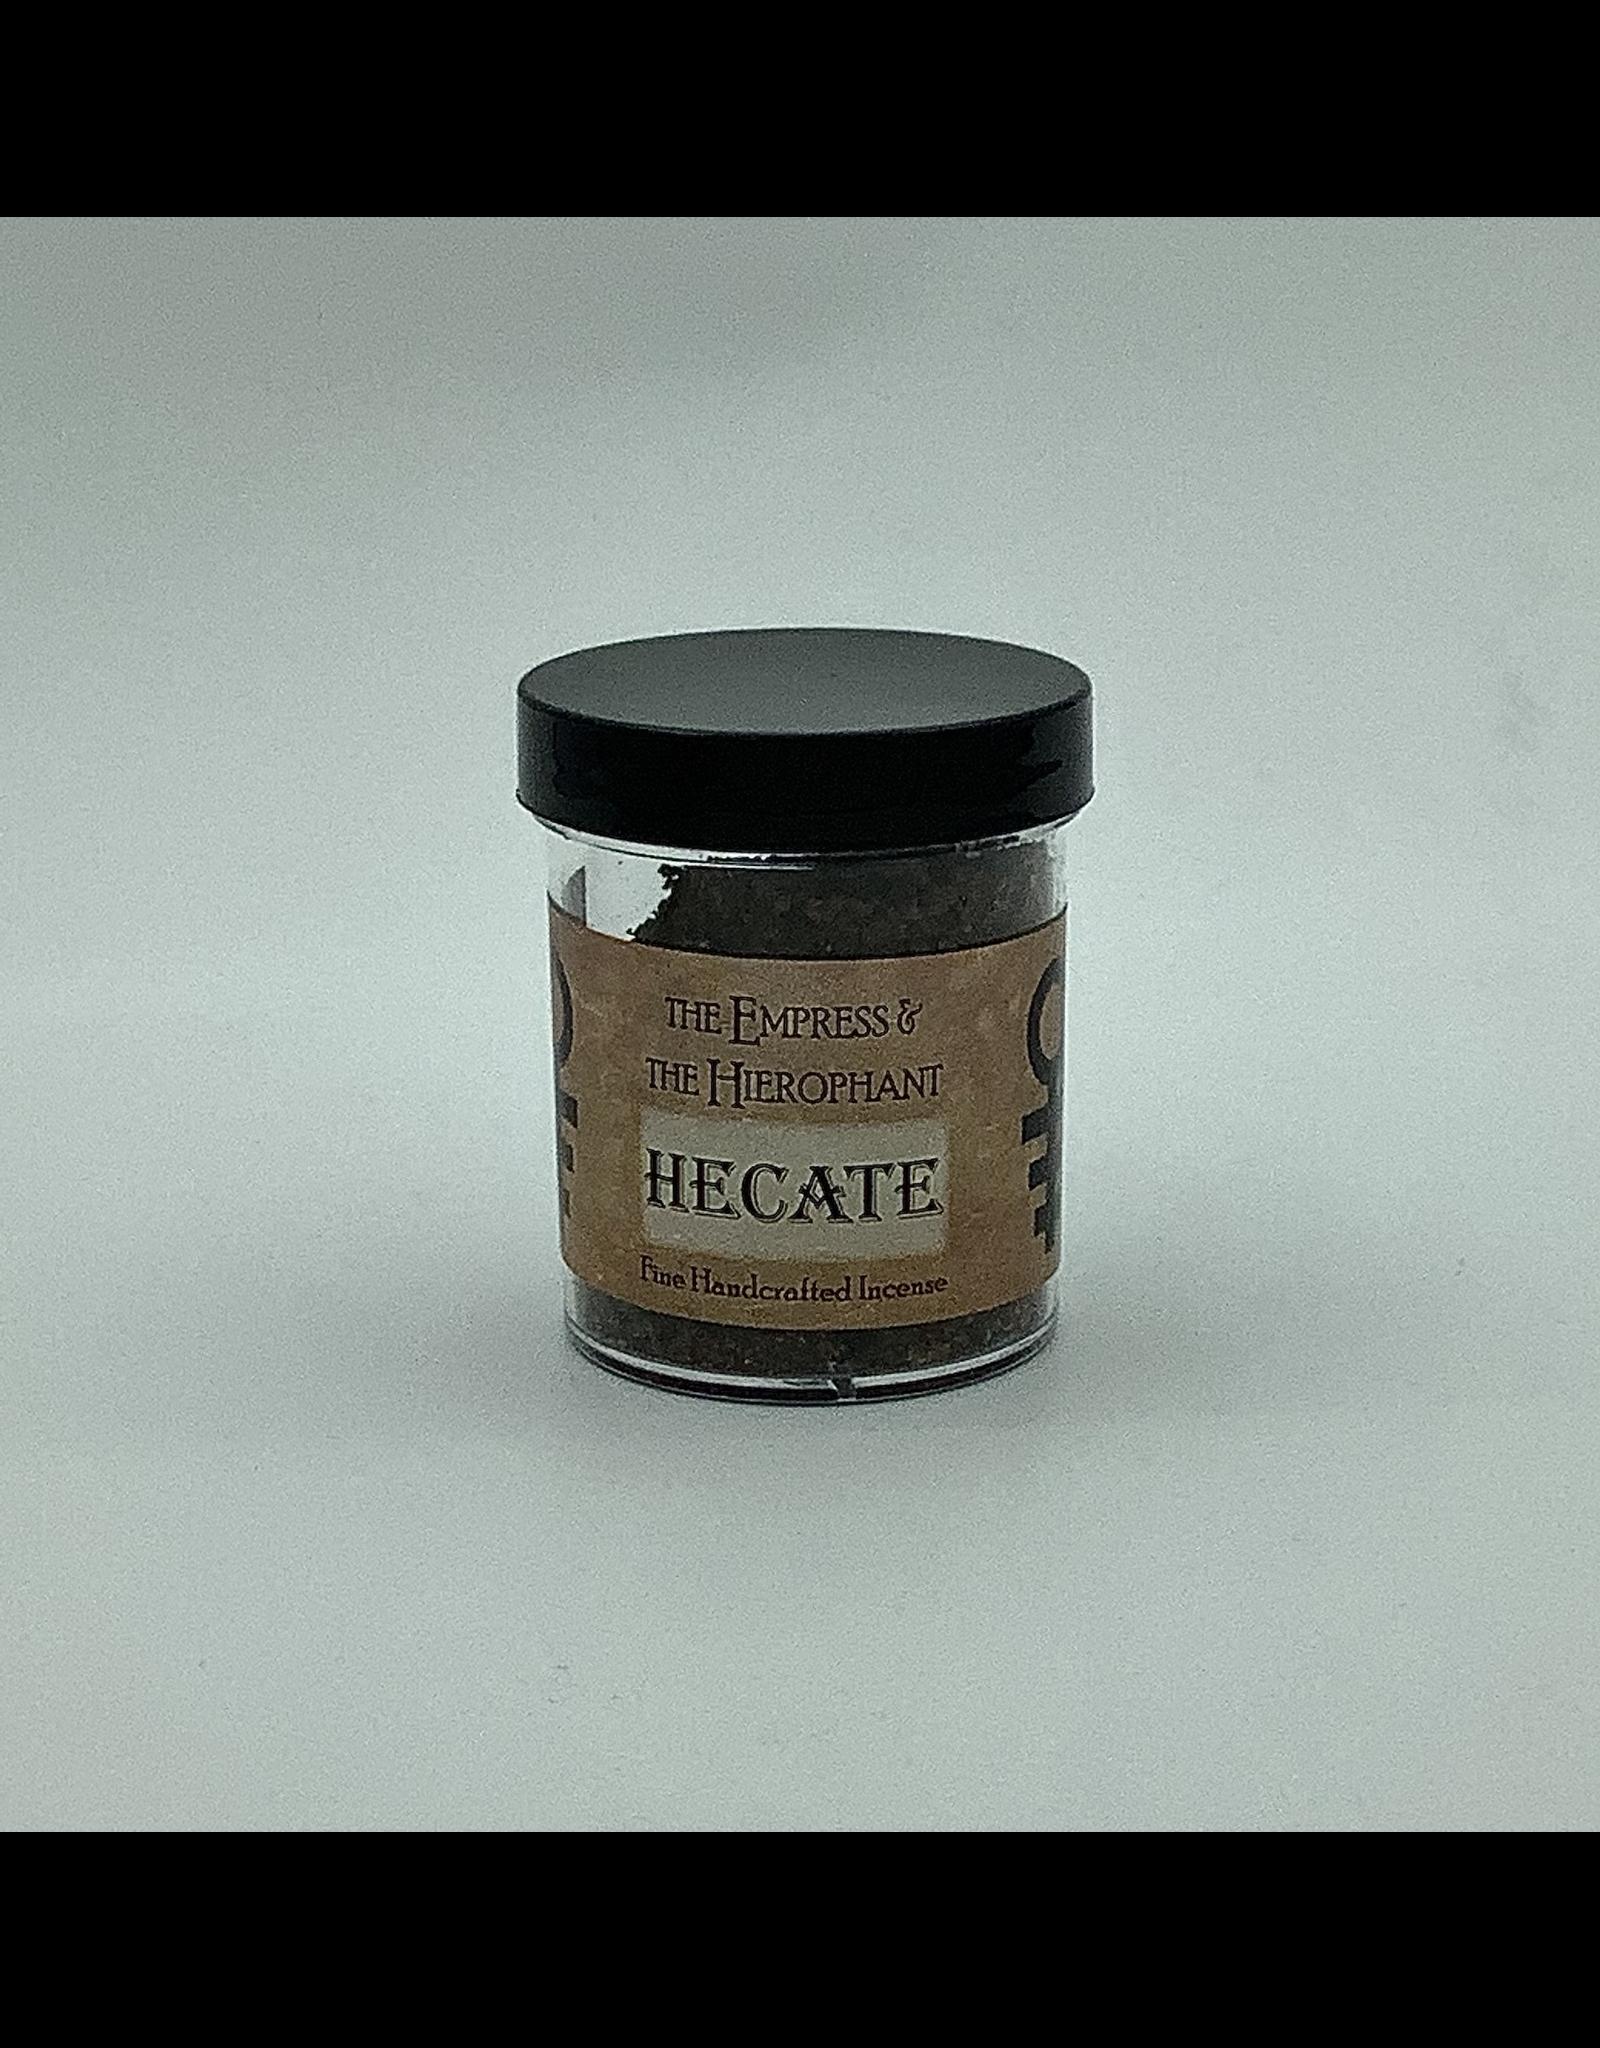 Hecate Magickal Incense